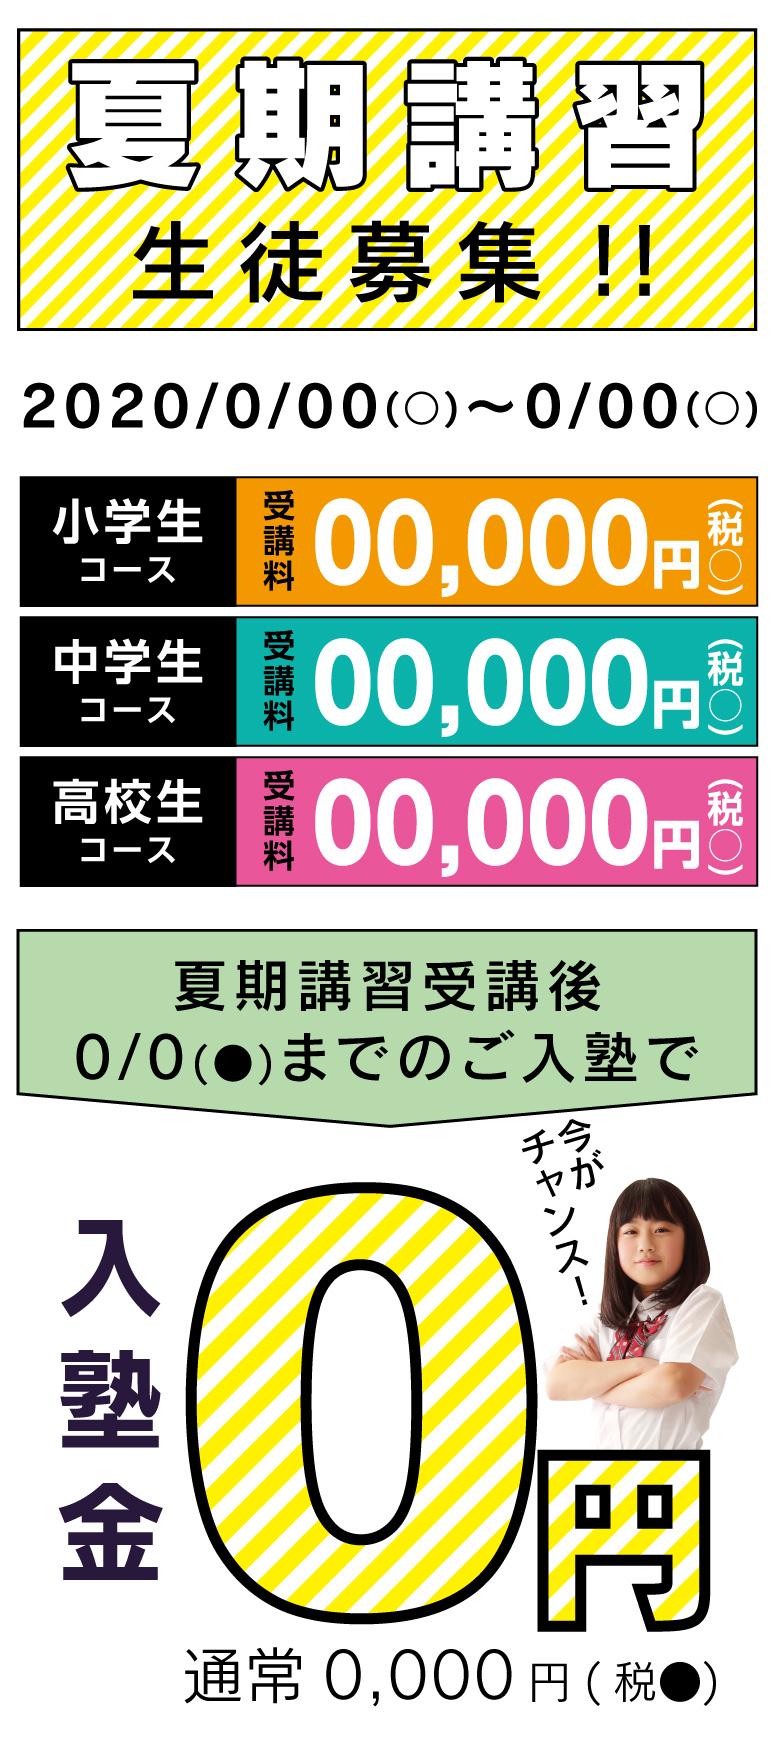 kds-case-20n-a-10